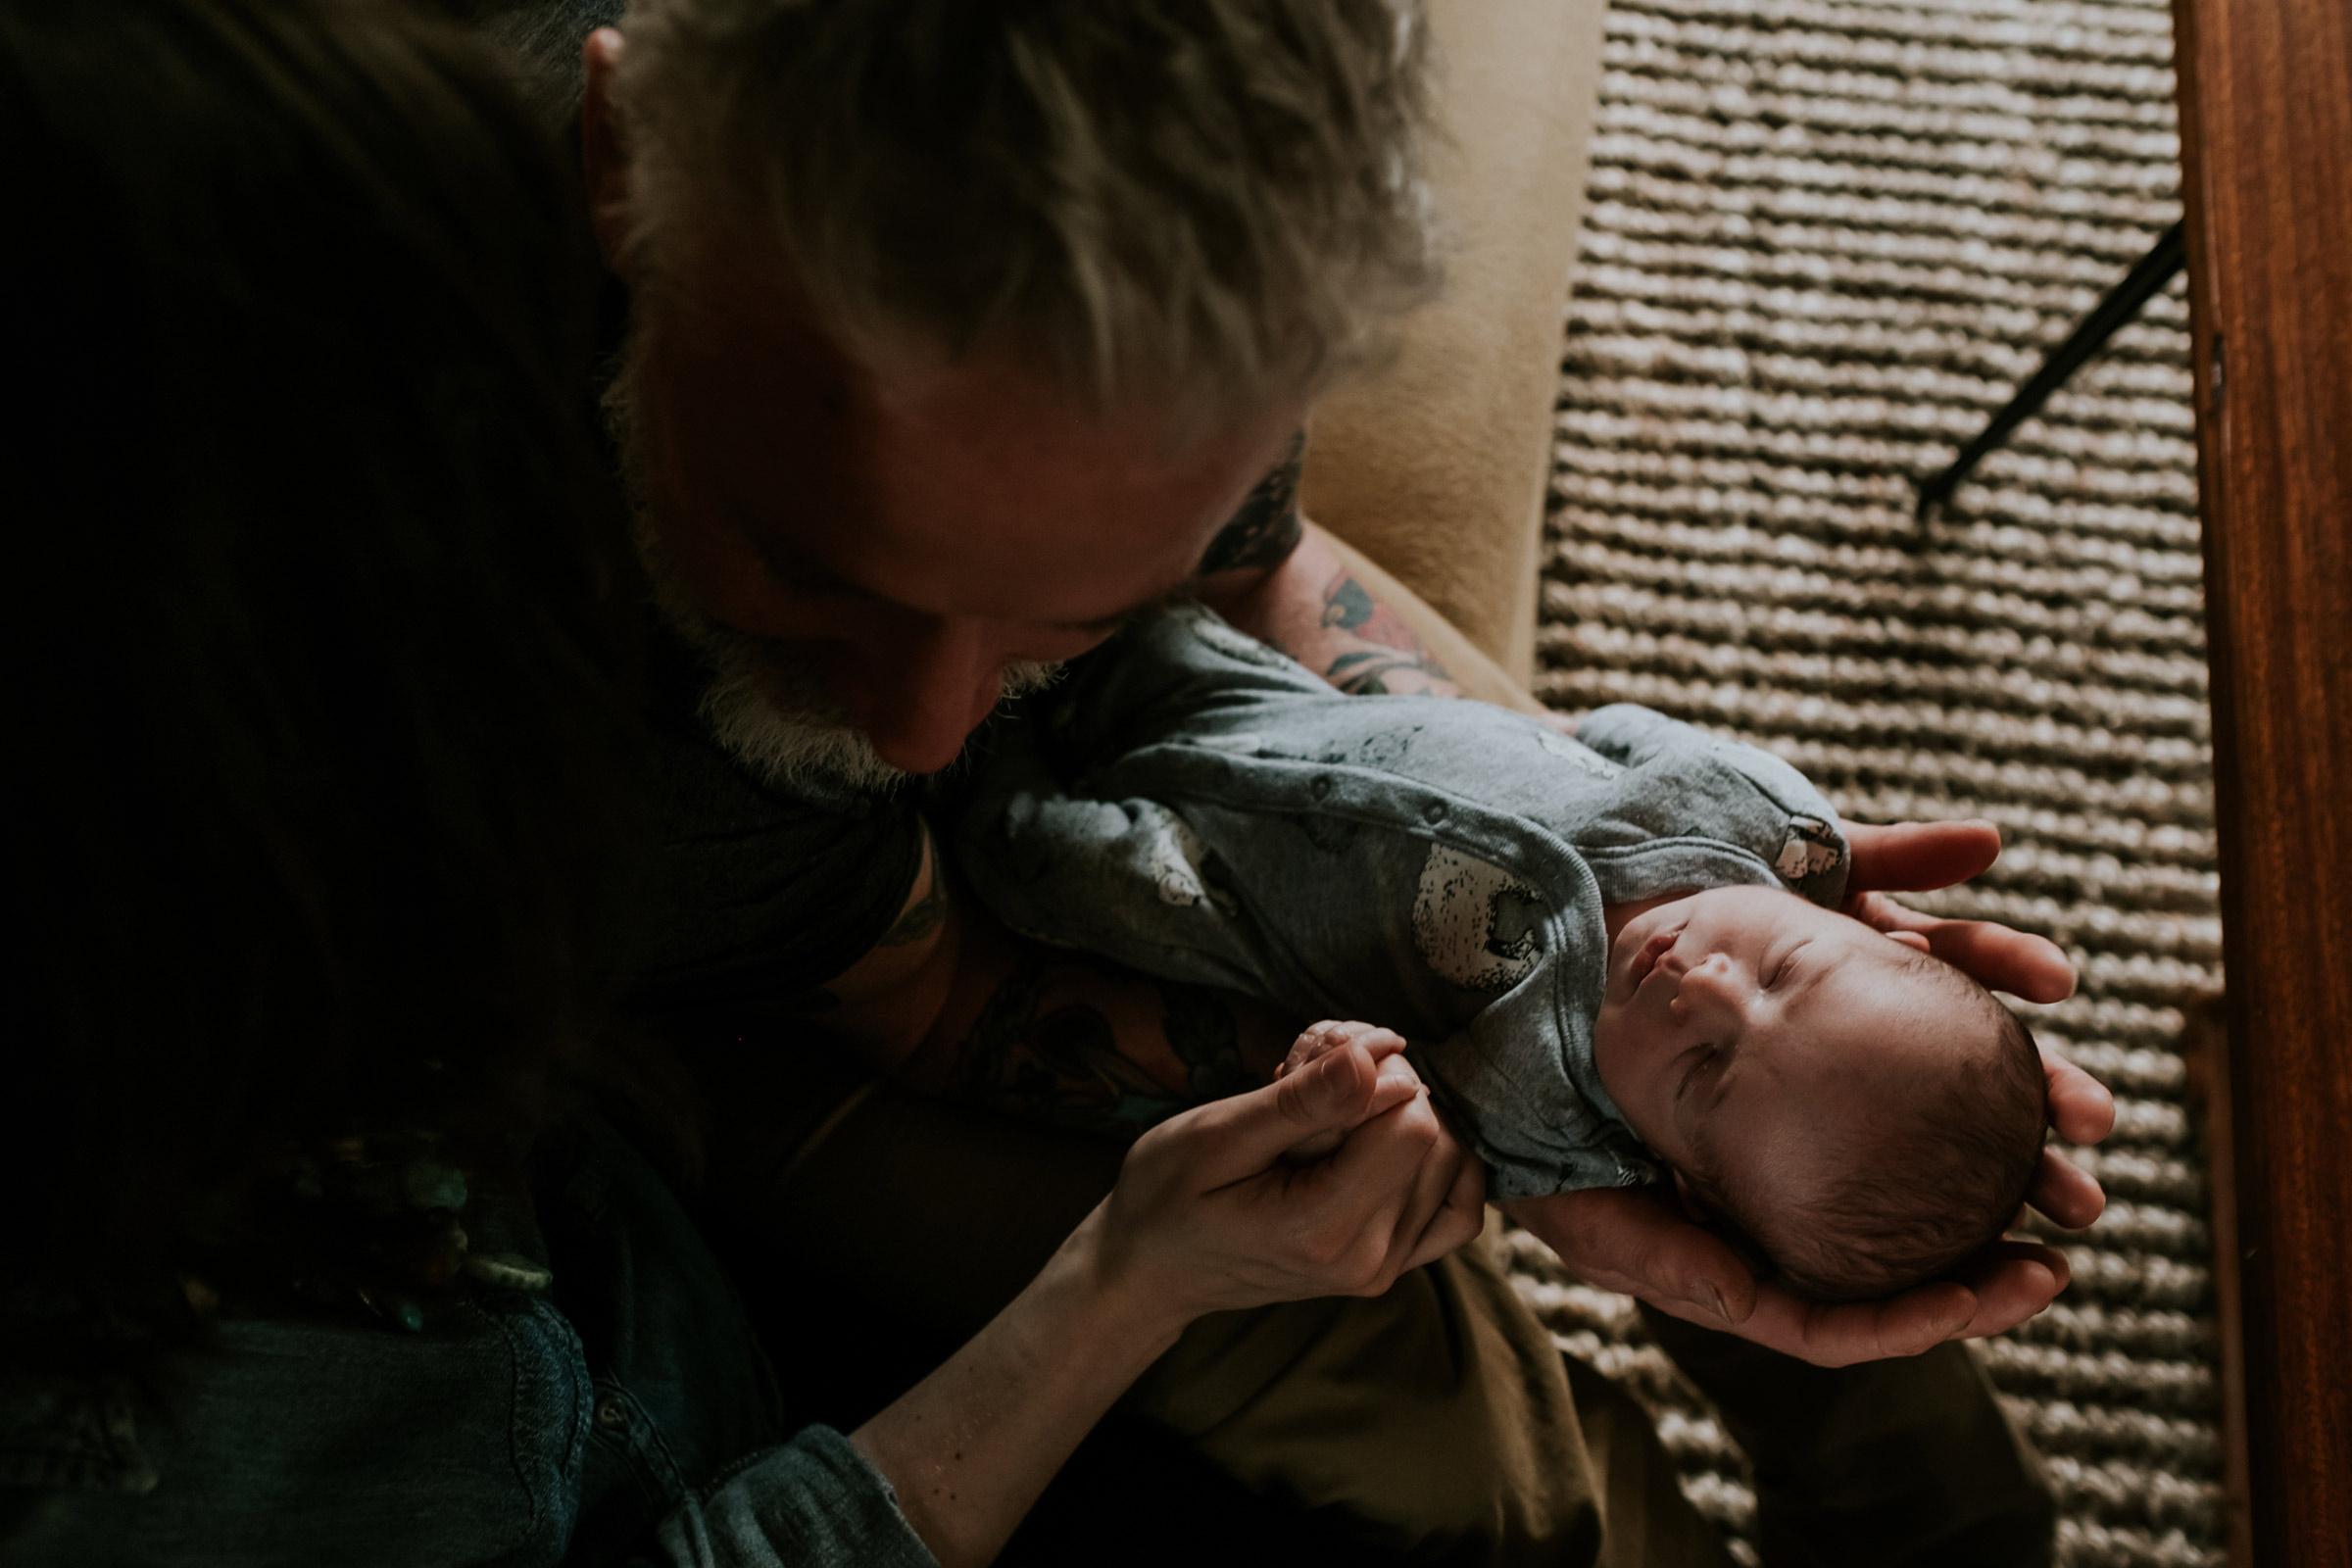 baby-rufus-and-dad--newborn-portrait-photographer-raelyn-ramey-photography-Des-Moines-Iowa-7.jpg